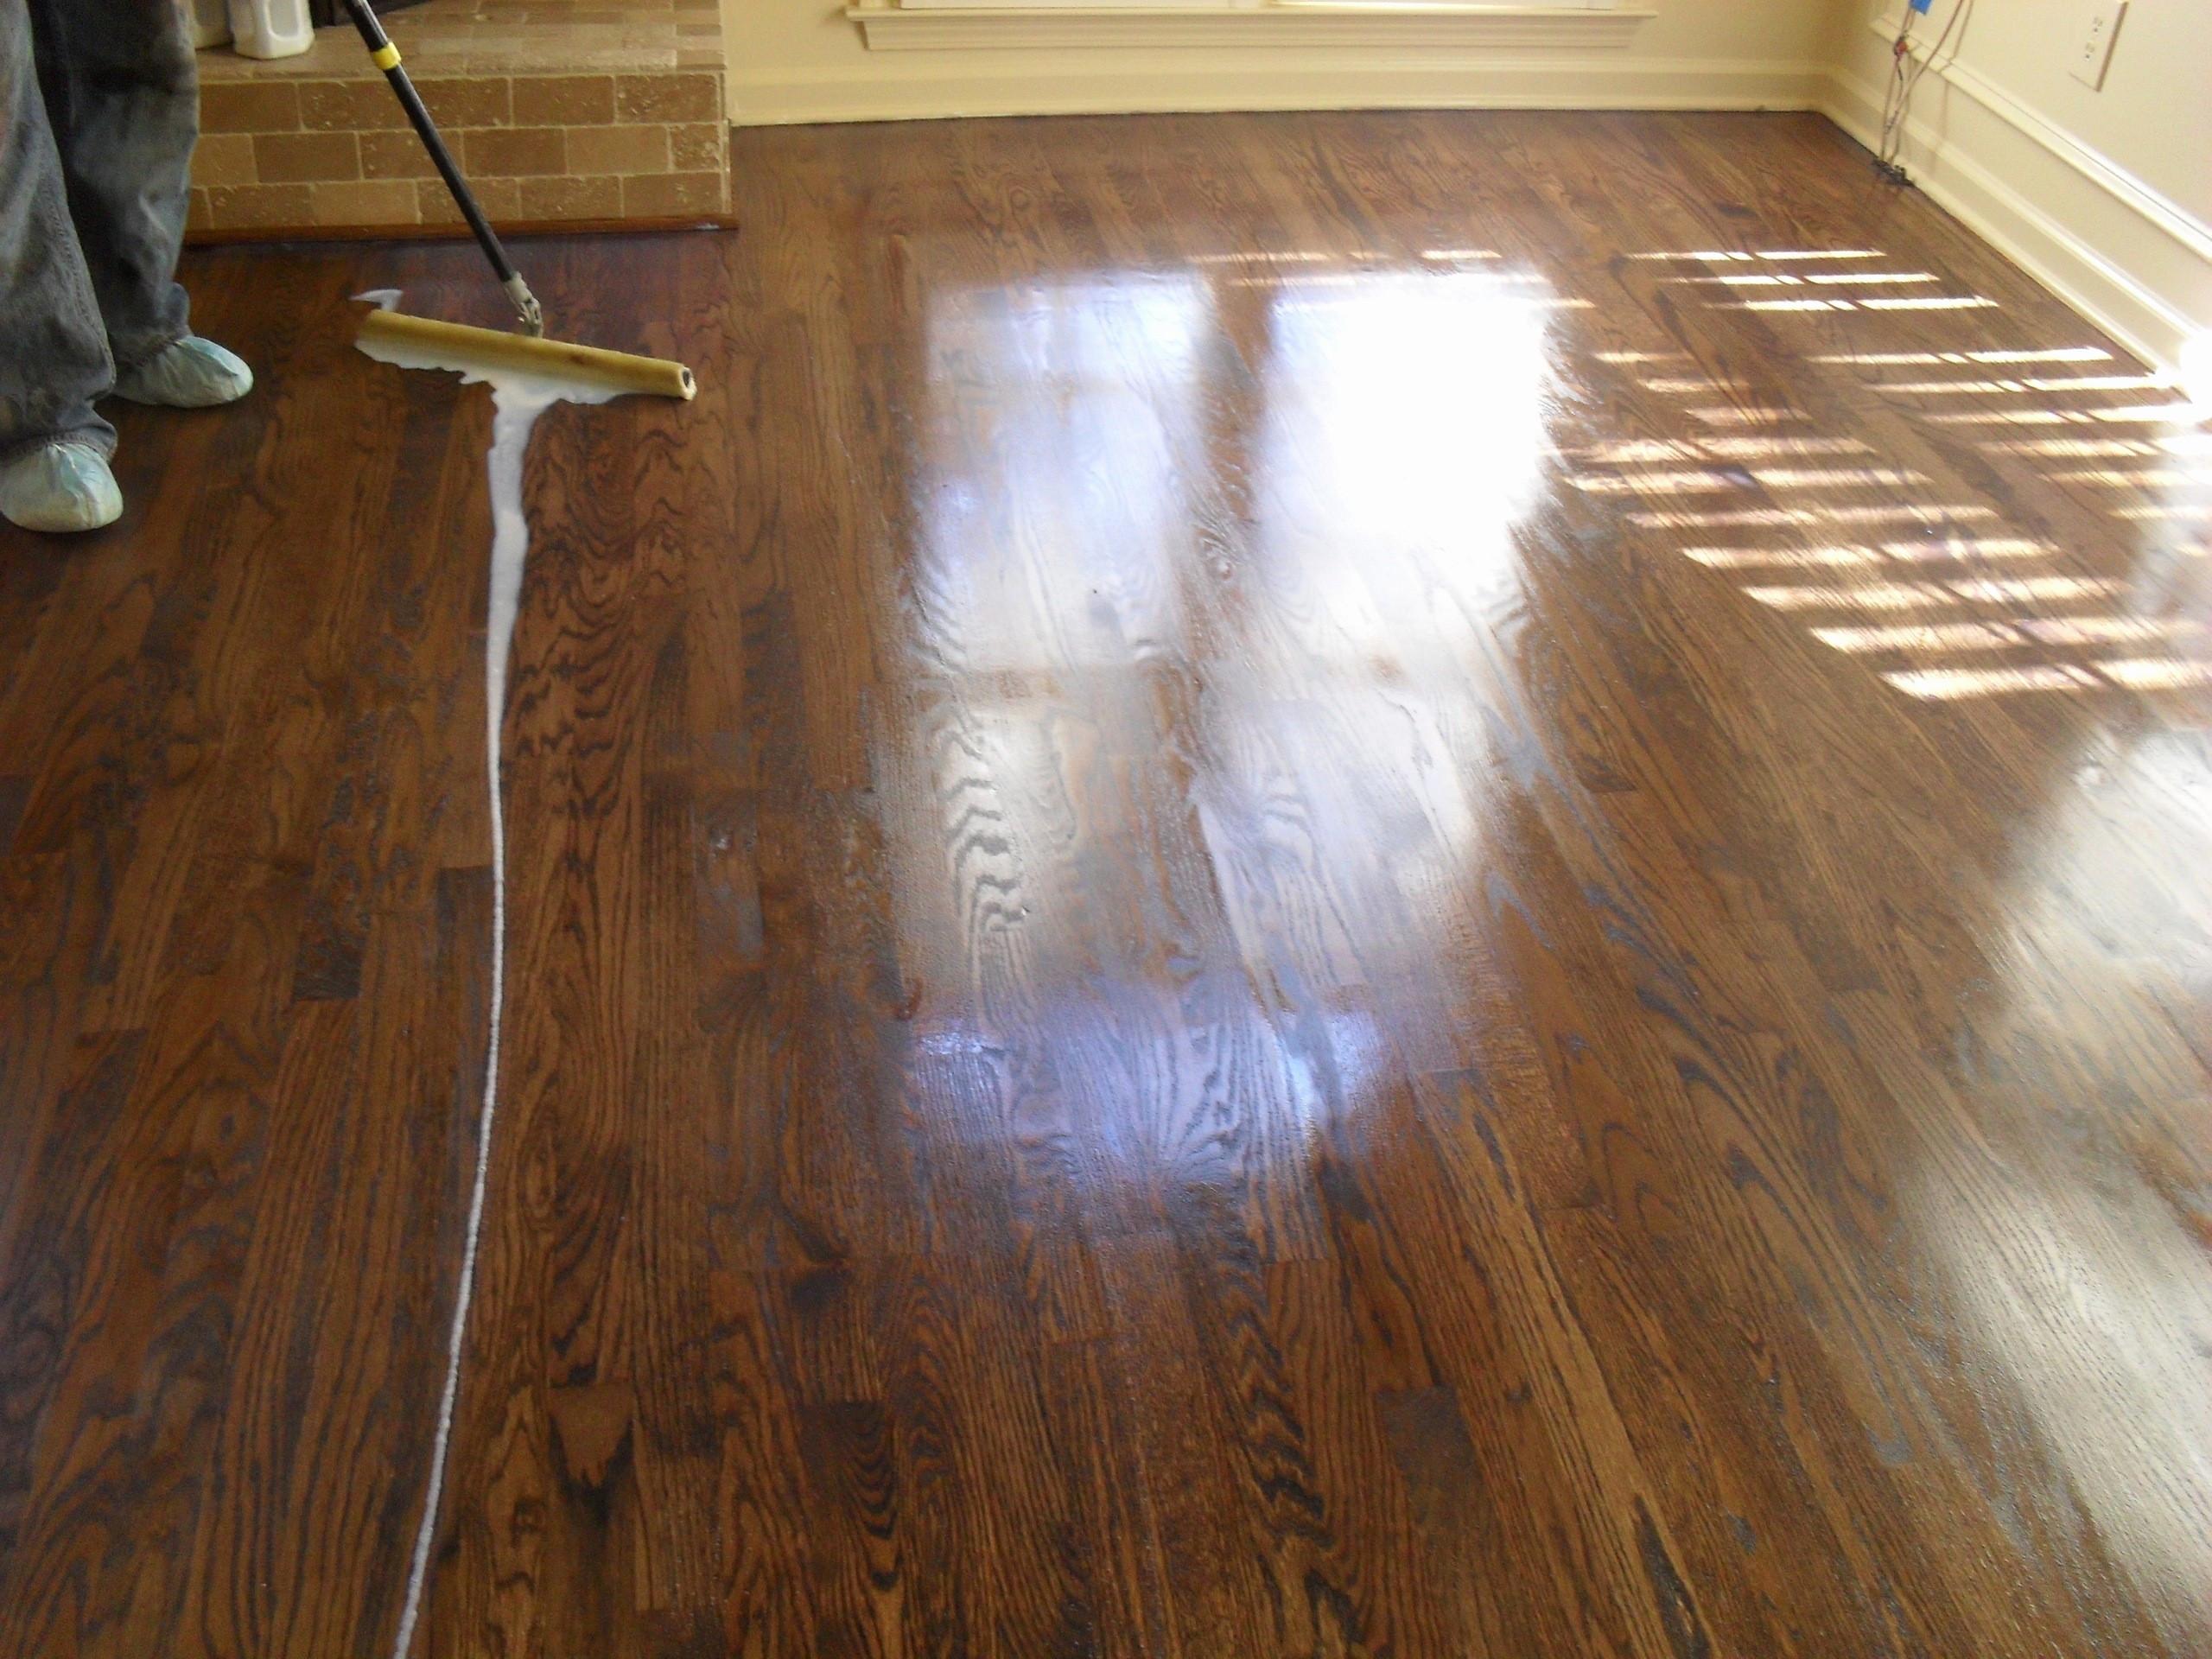 how hard is it to sand and refinish hardwood floors of cost to refinish hardwood floors floor plan ideas for cost to refinish hardwood floors 50 beautiful redoing hardwood floors 50 s